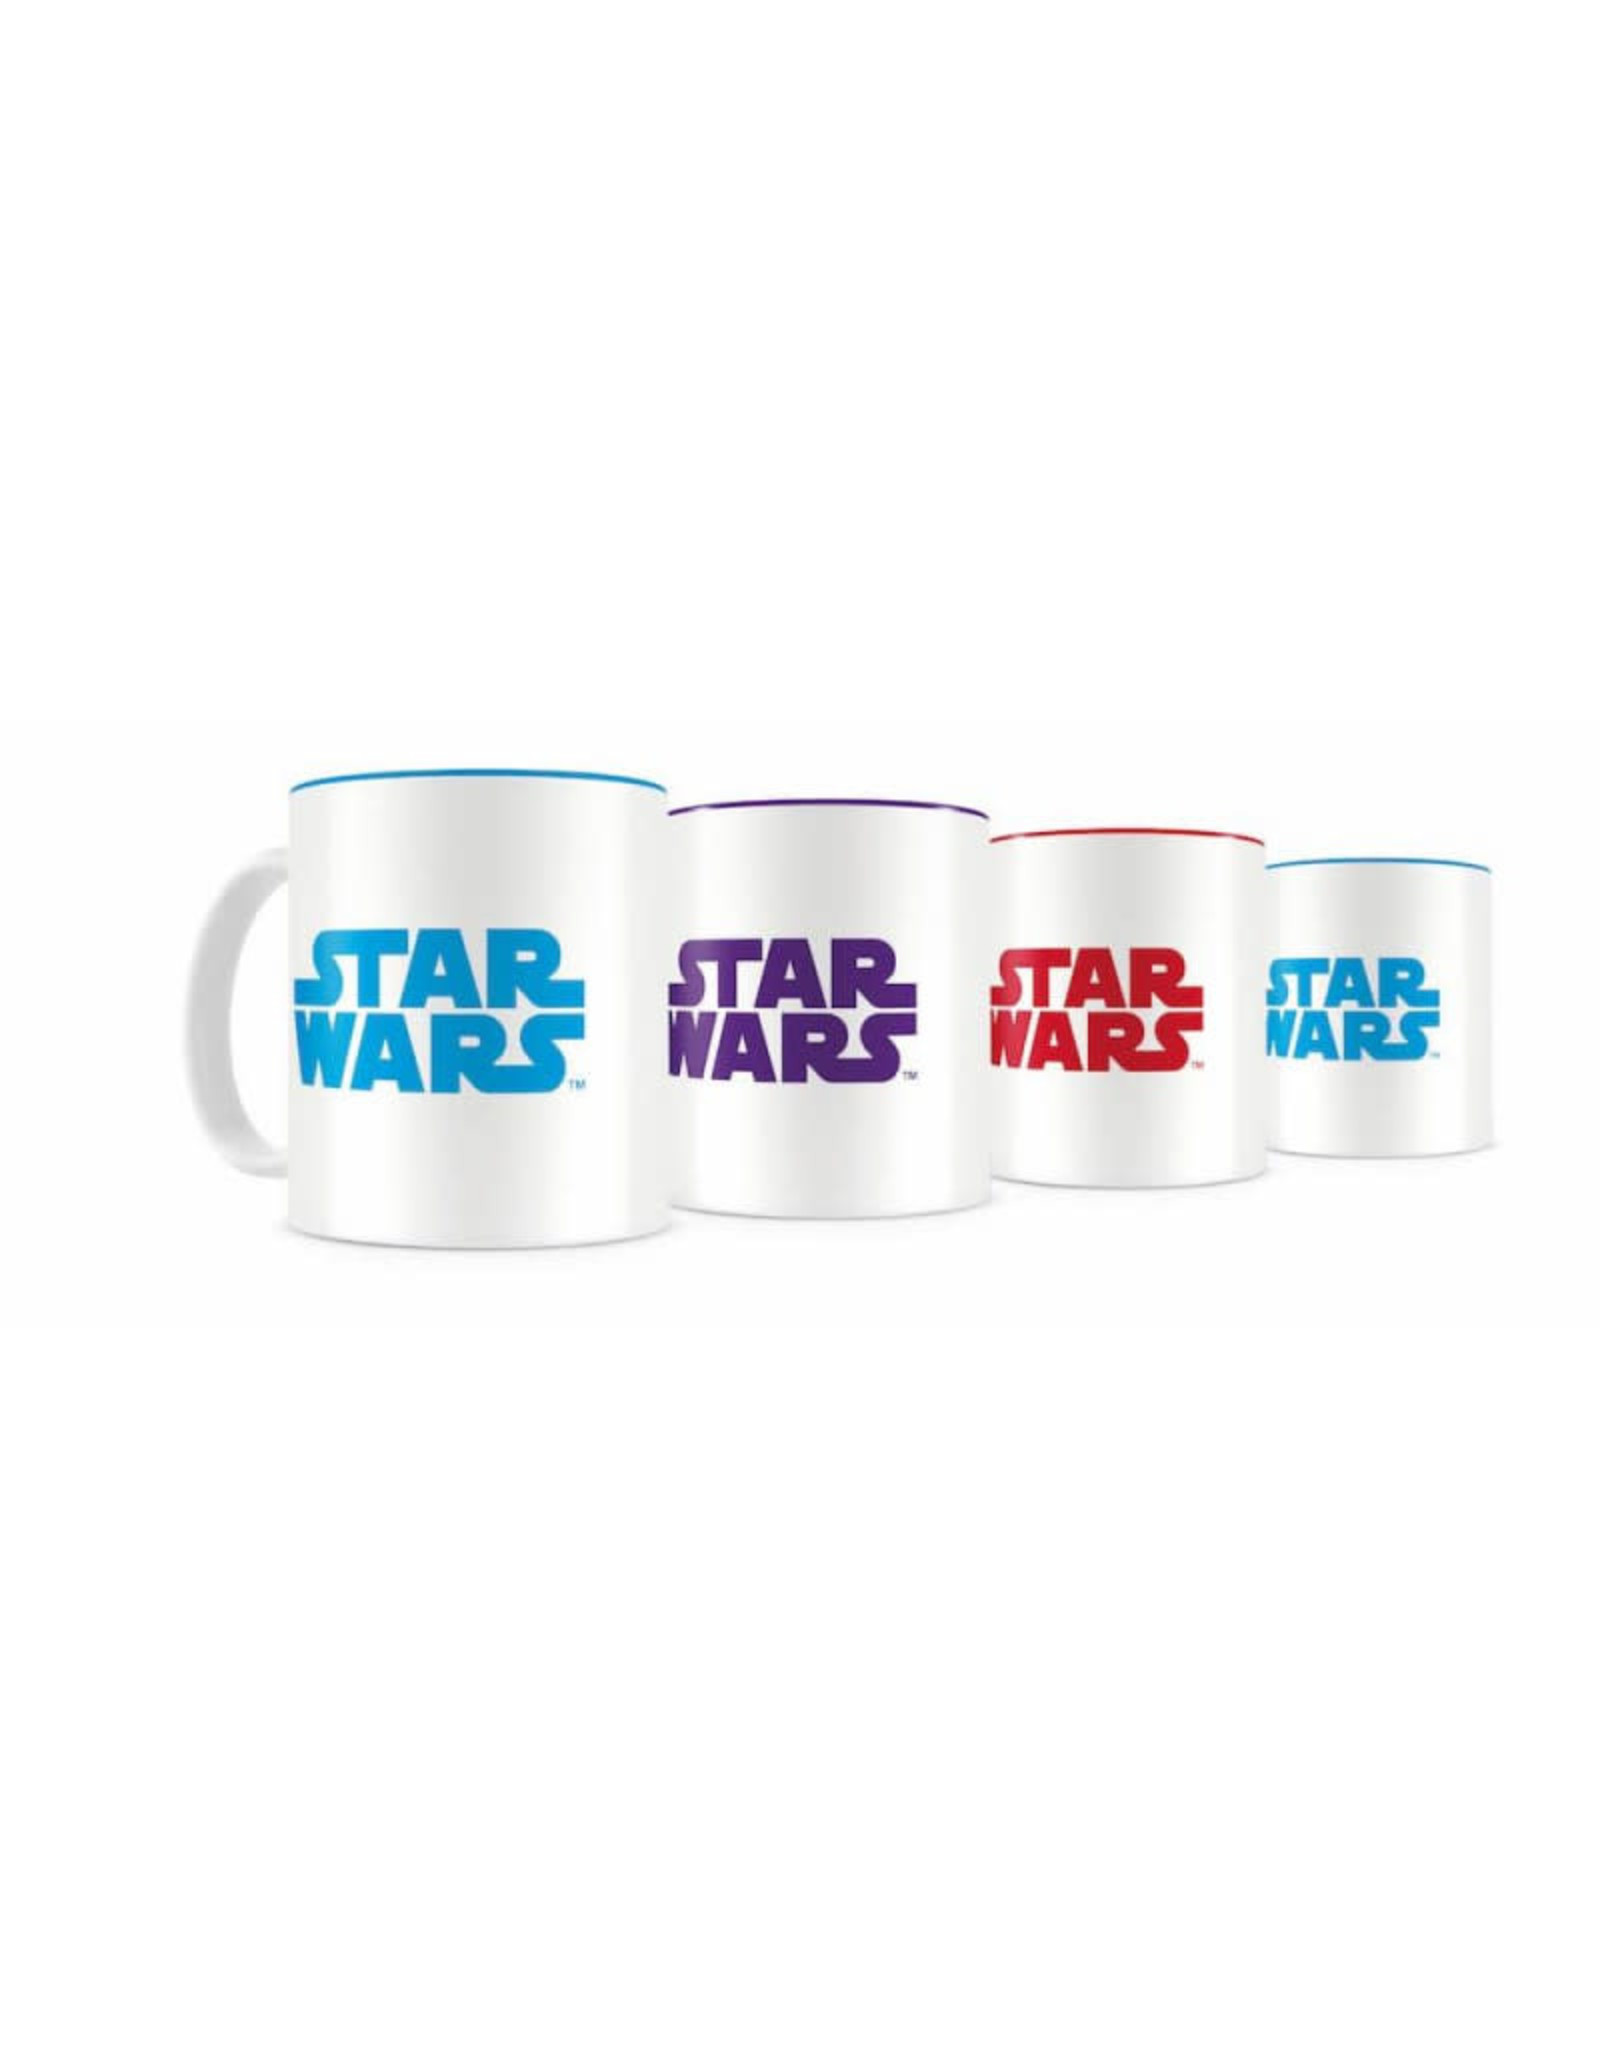 SD Toys STAR WARS Set of 4 Espresso Mugs - Resistance